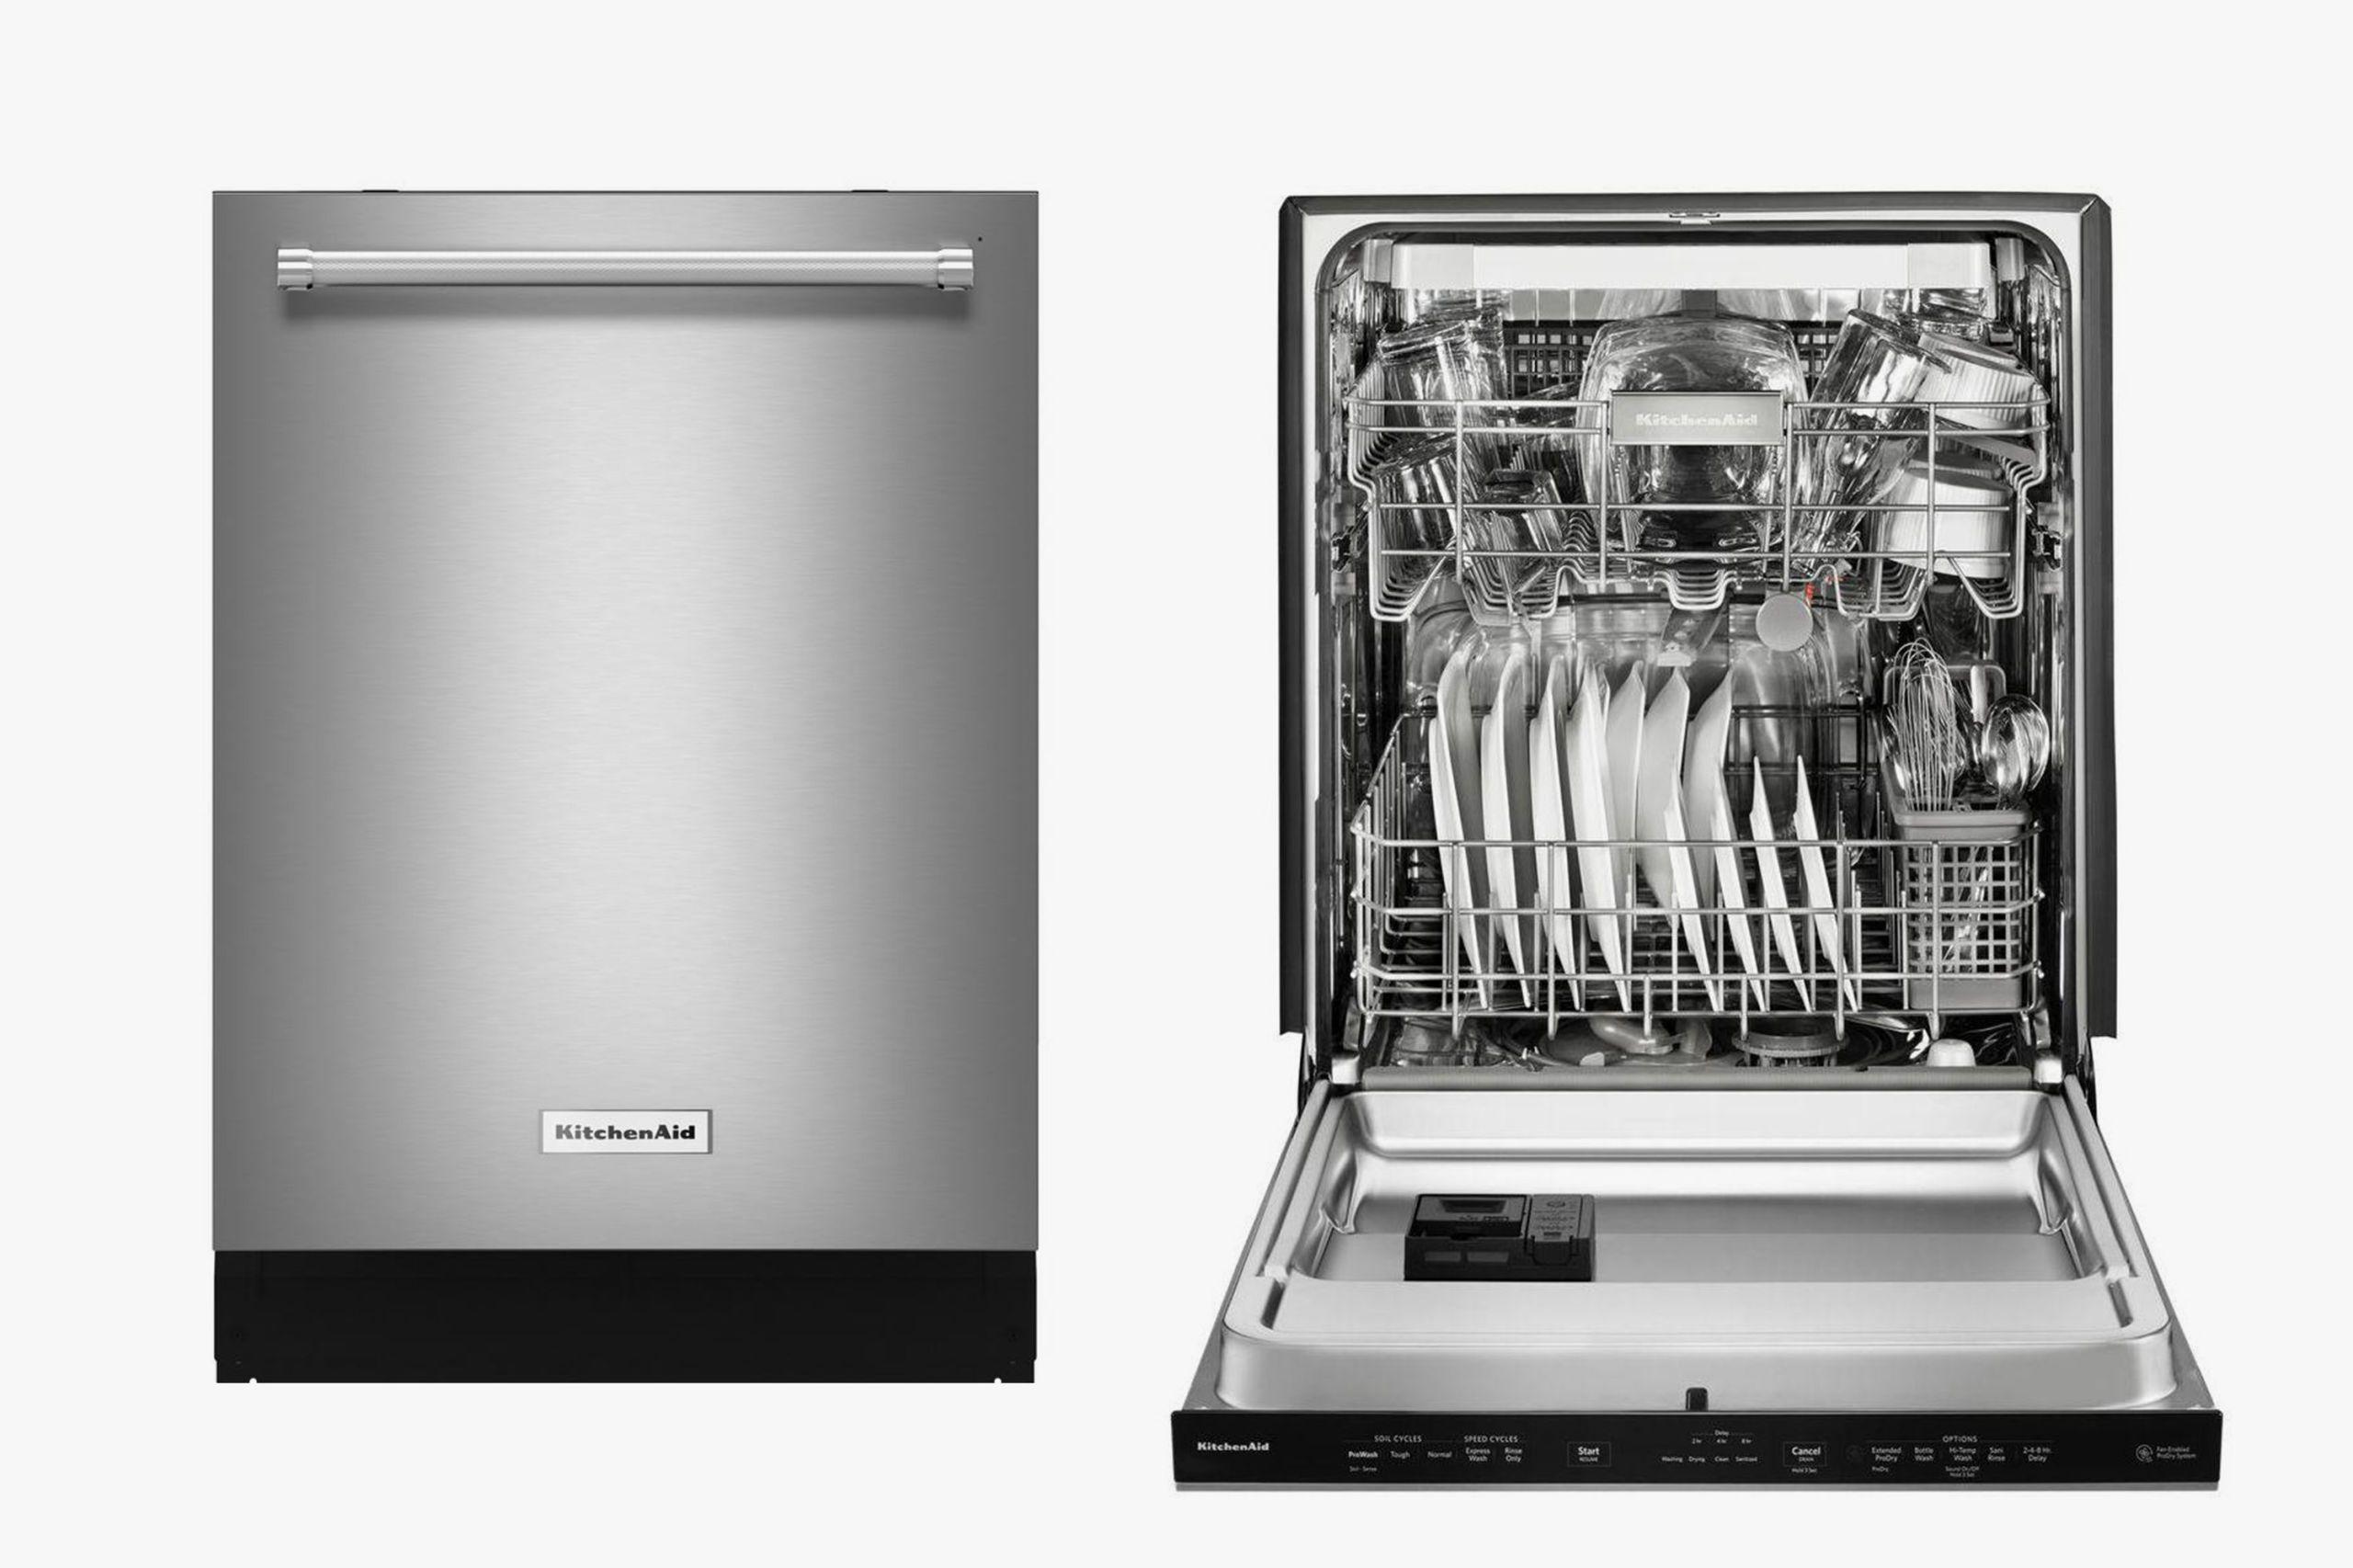 10 Best Dishwashers for 2020 - Top Dishwasher Reviews